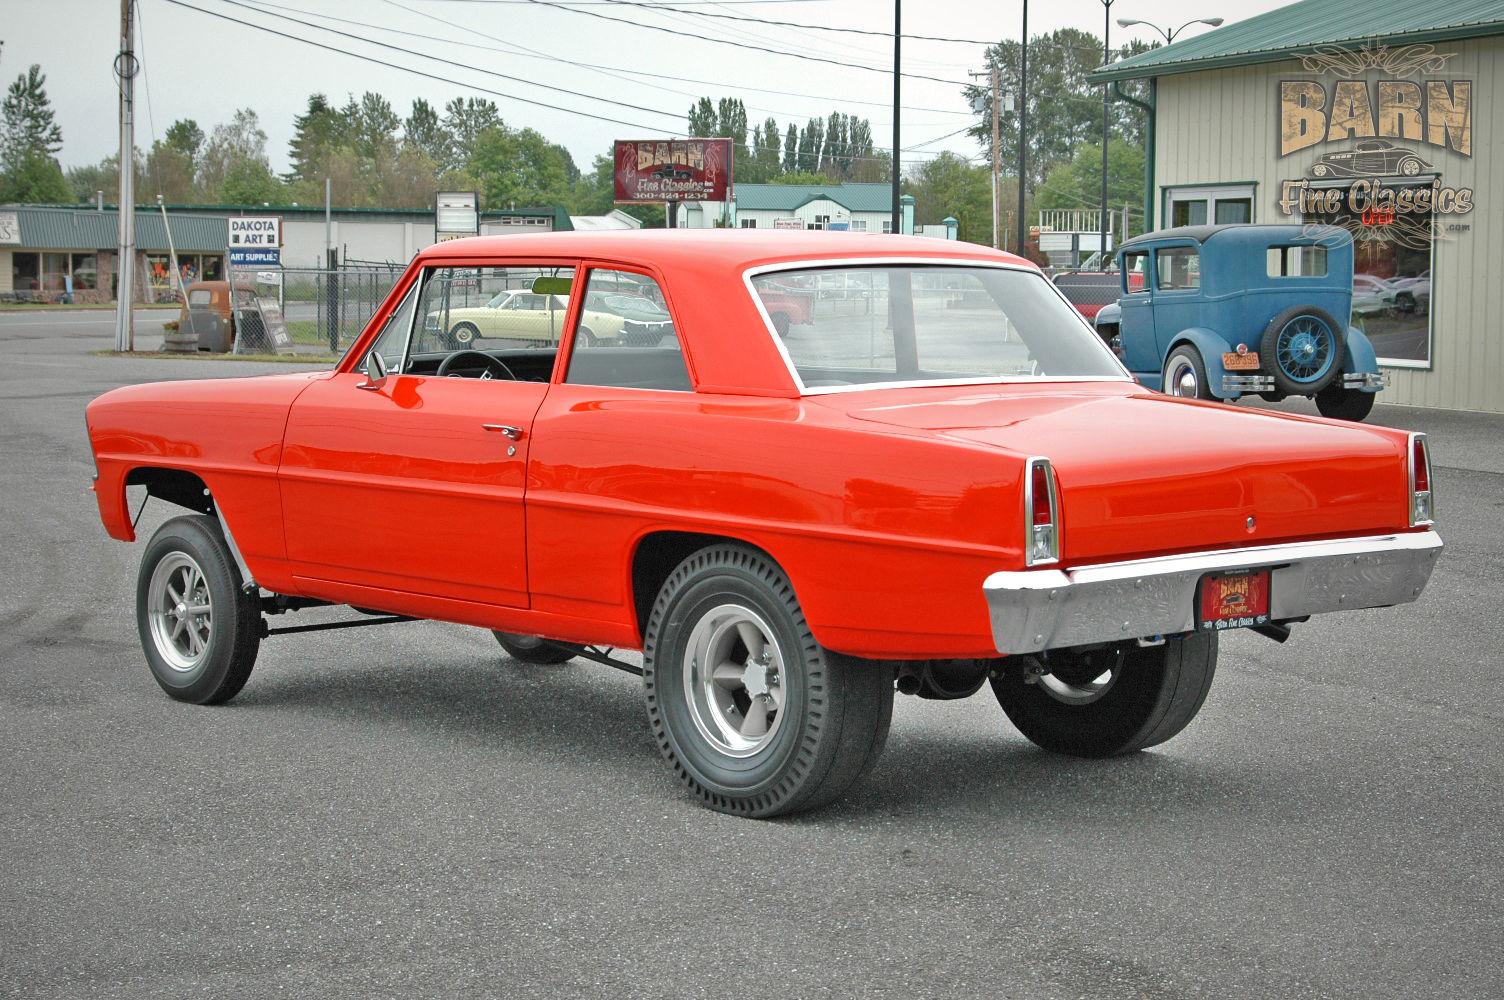 Manifold Chevrolet Polished Intake 350